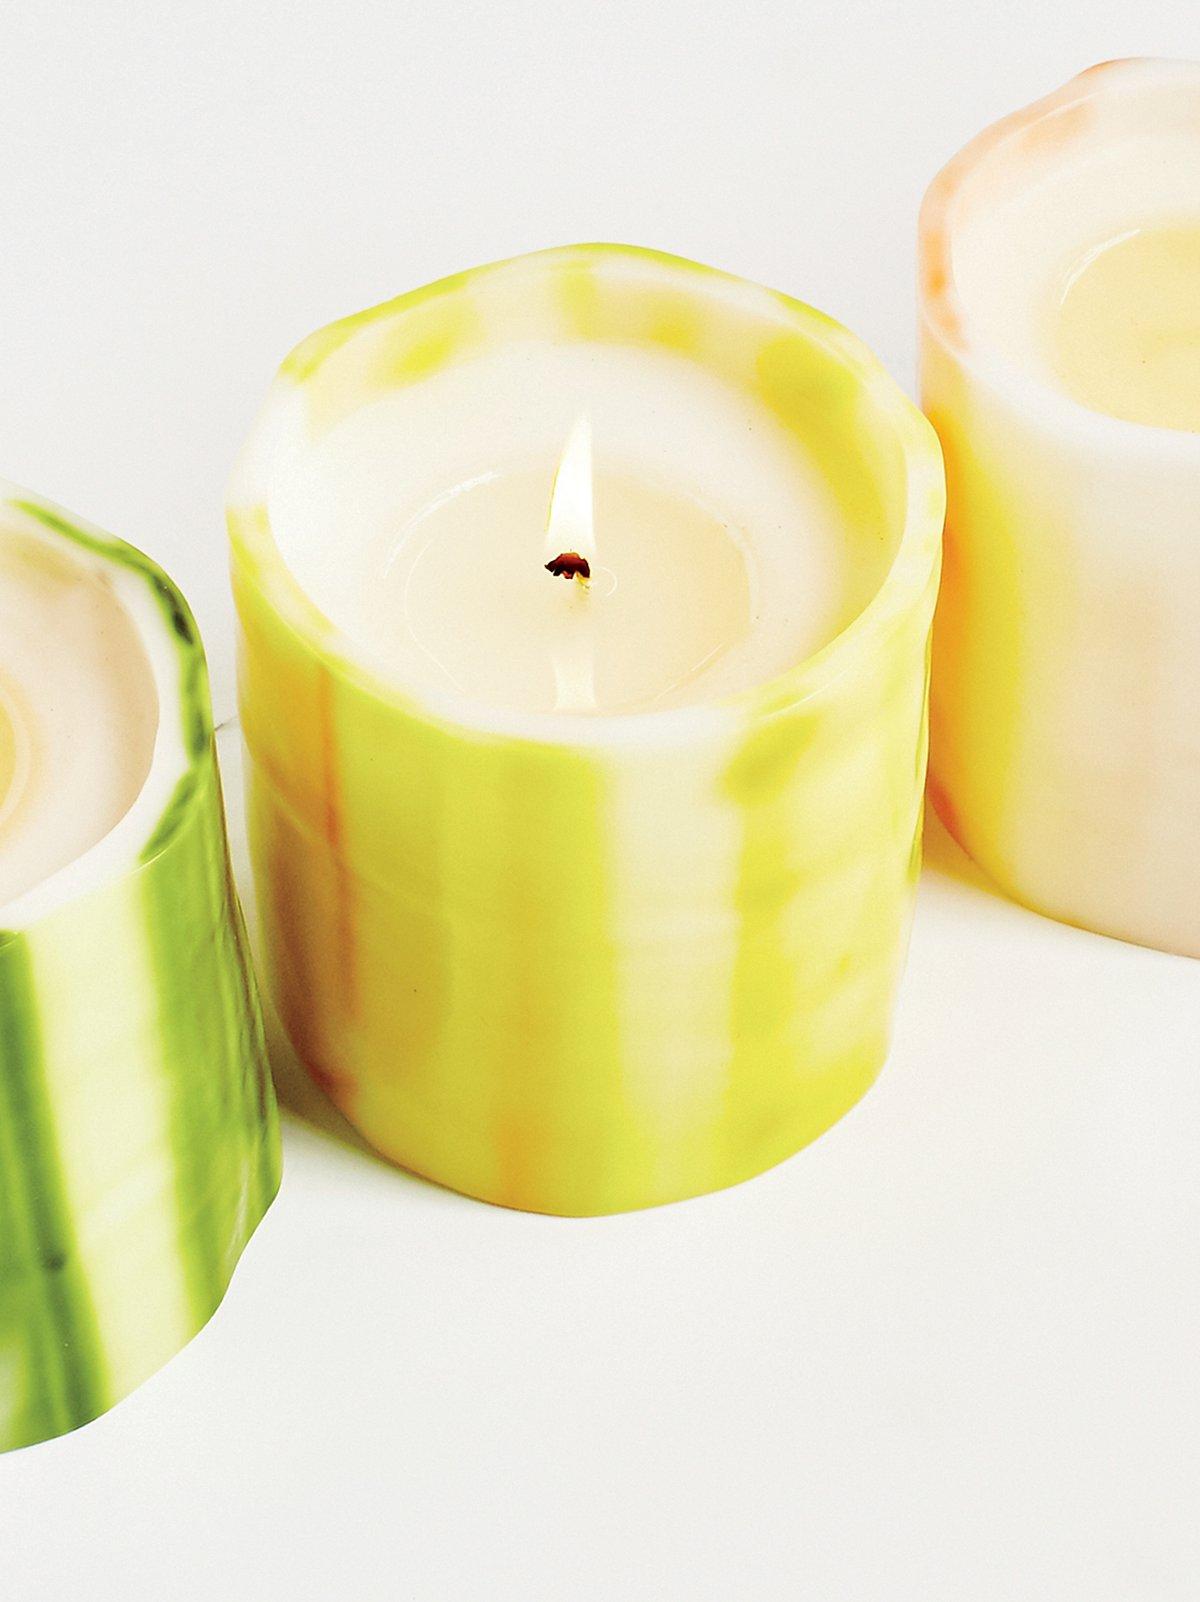 Artisanal Candle